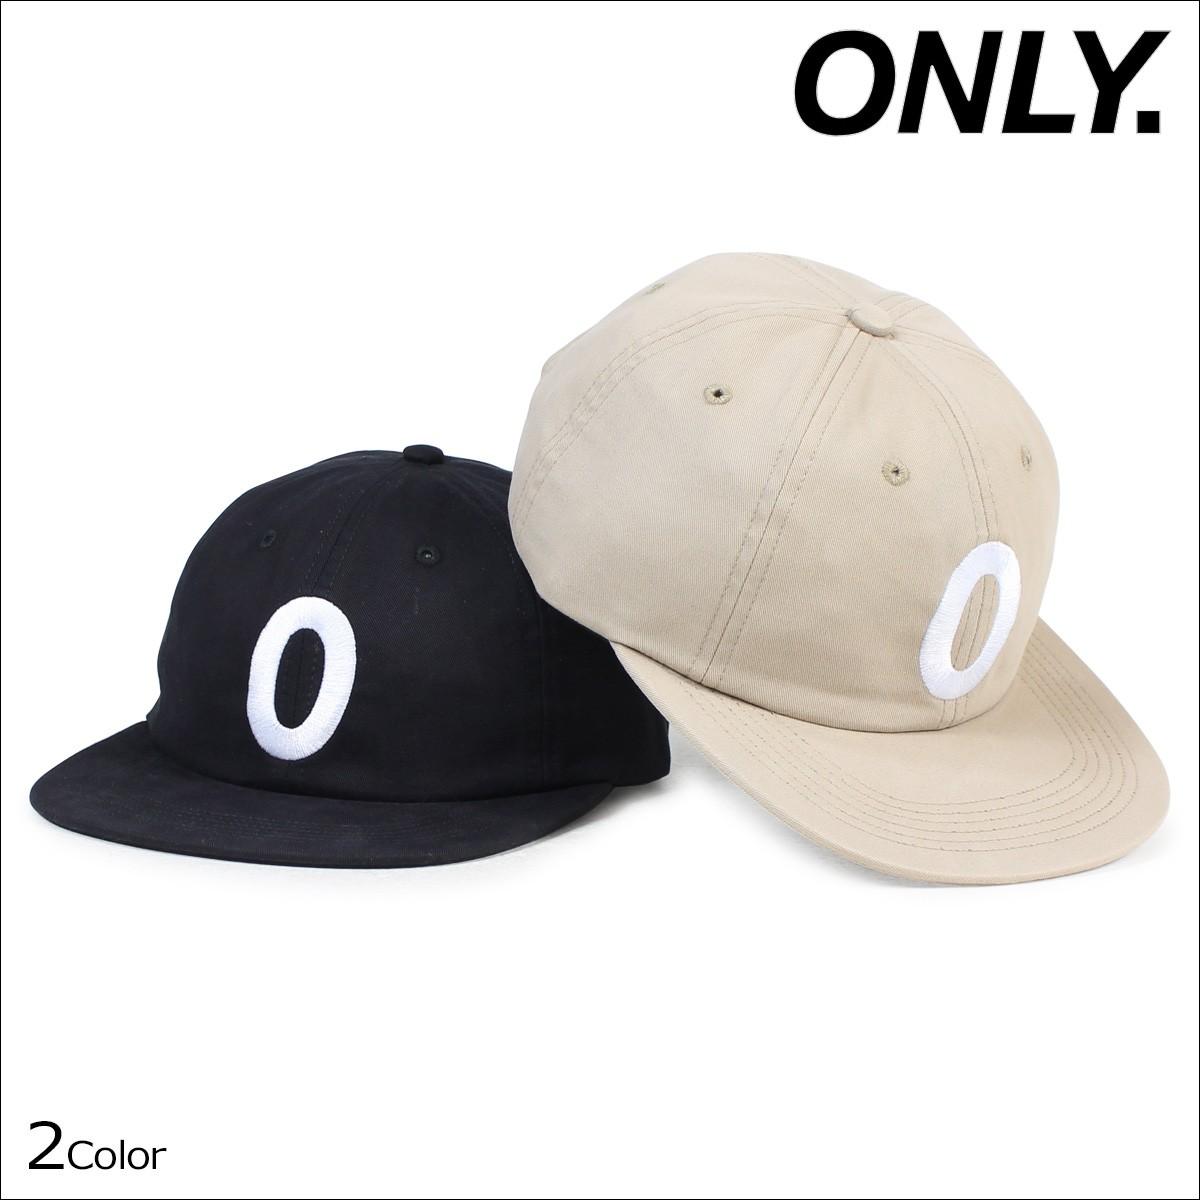 ONLY NY オンリーニューヨーク キャップ 帽子 メンズ レディース DERBY POLO HAT ストラップバック コットン ブラック カーキ [12/22 新入荷]